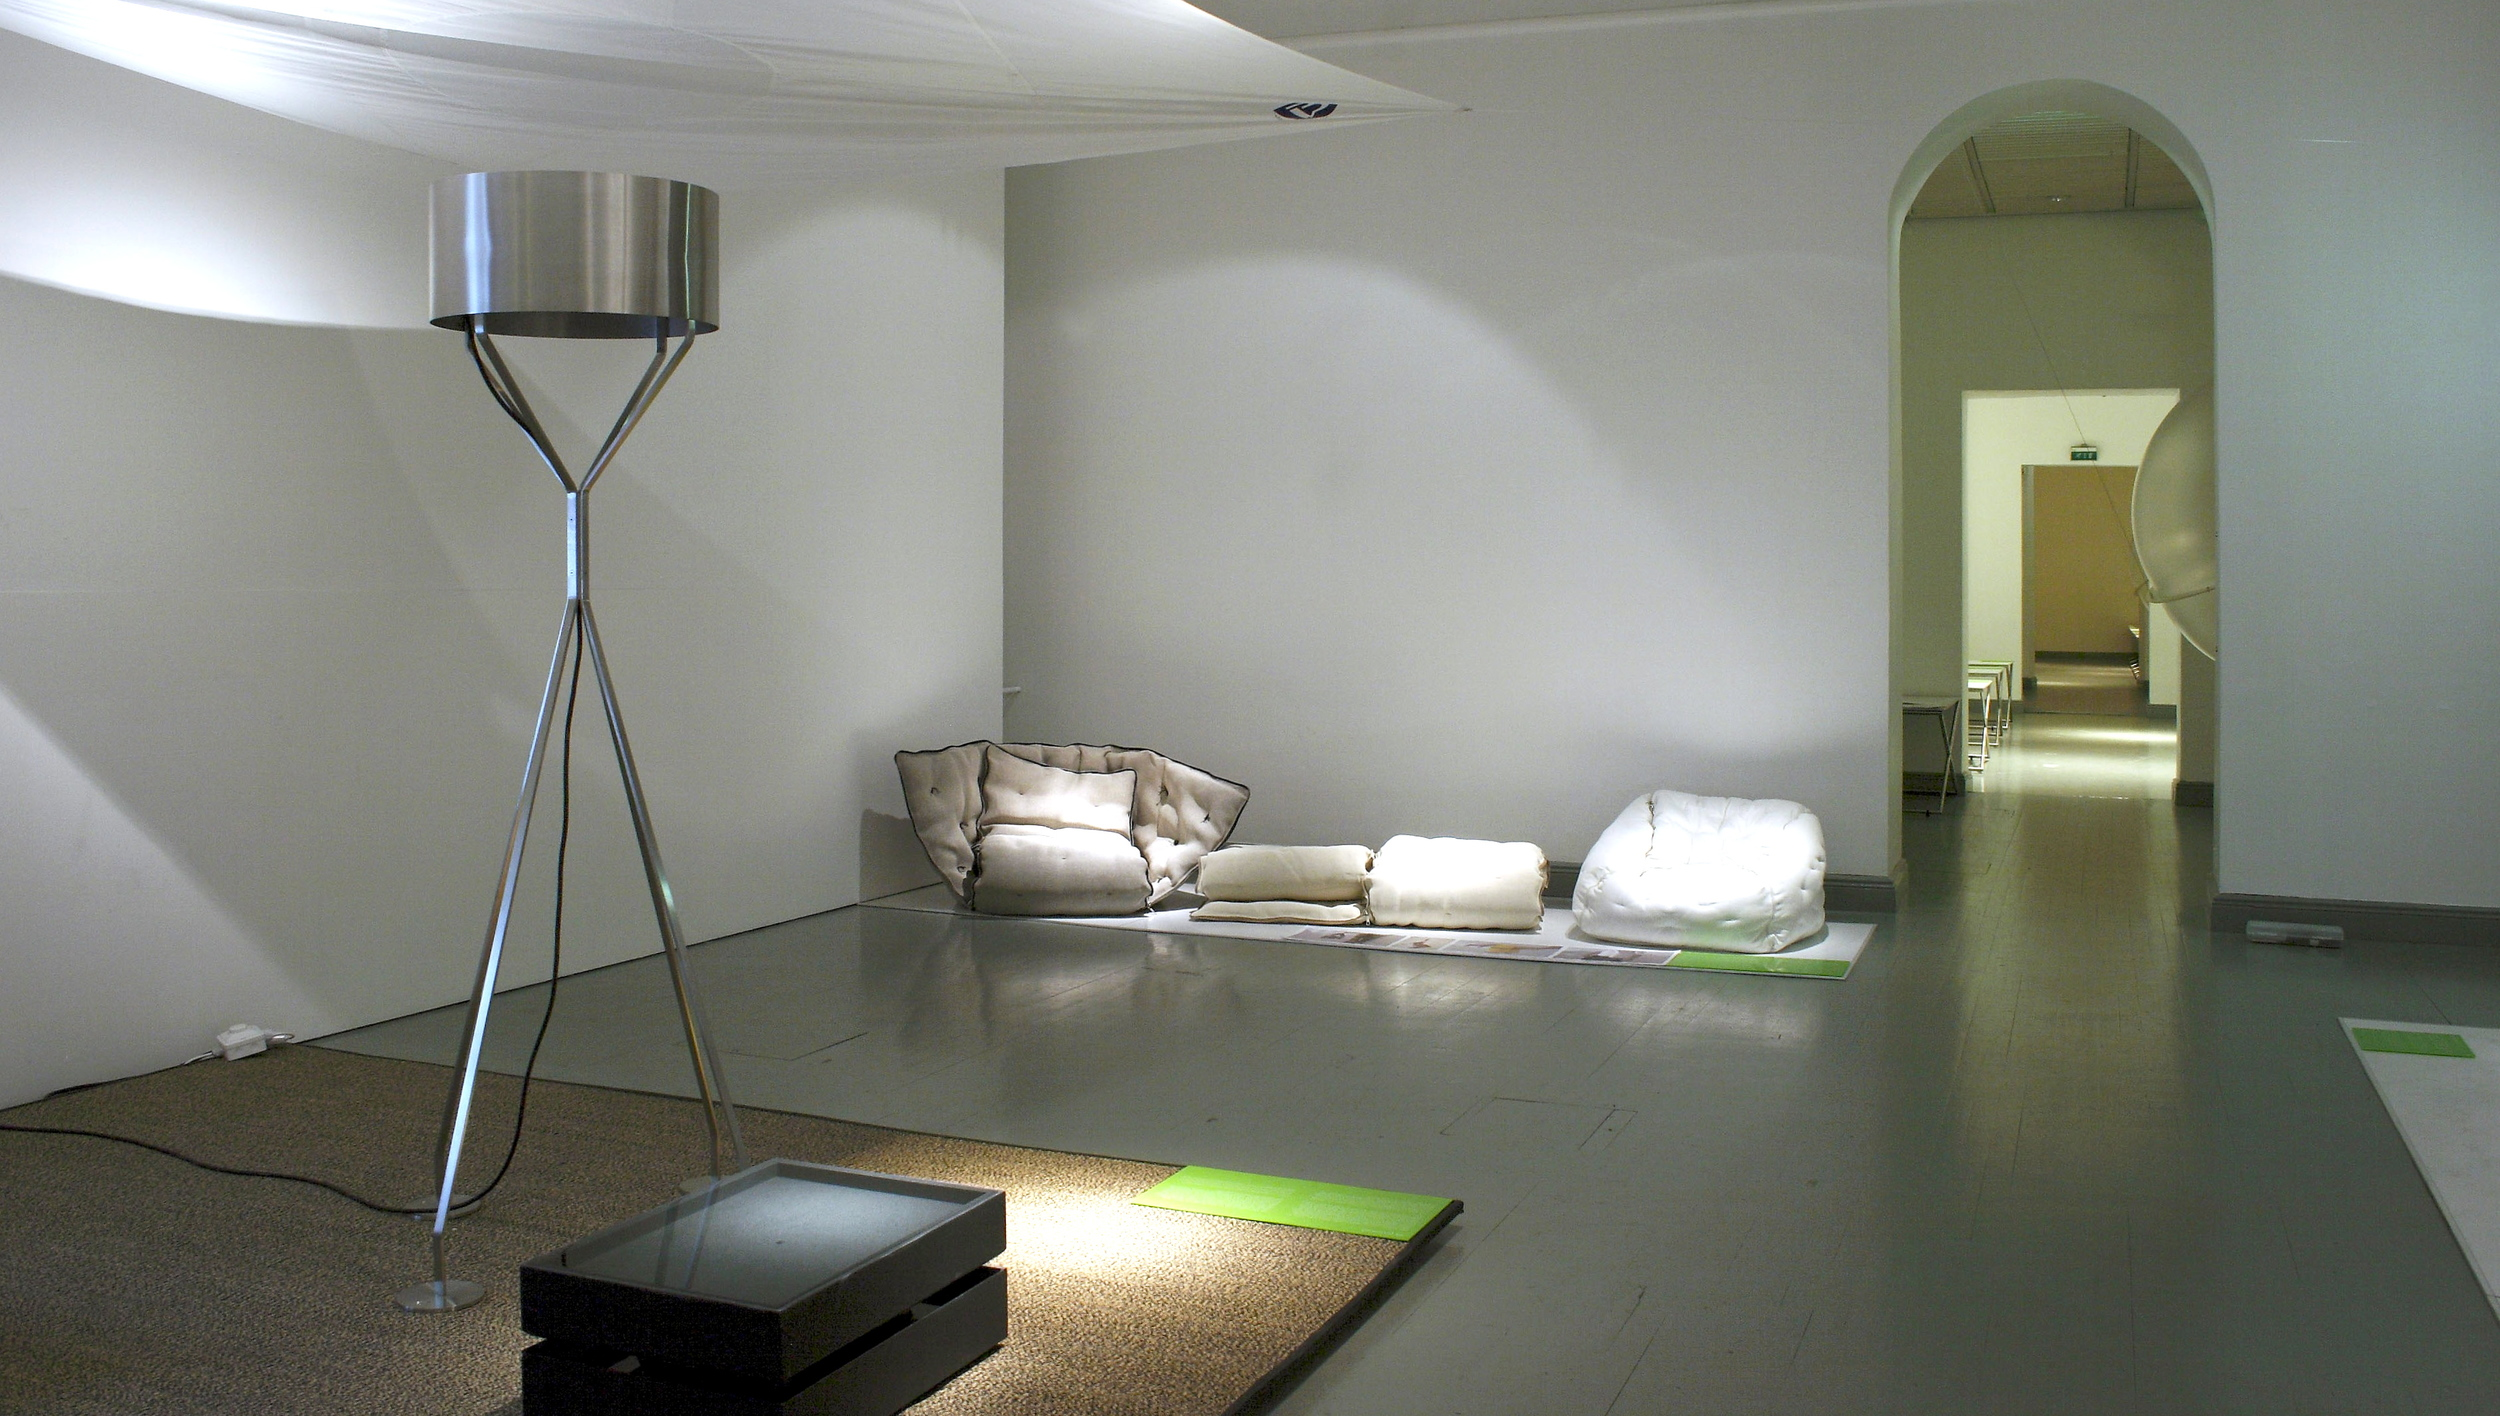 Sauma installation view from Helsinki